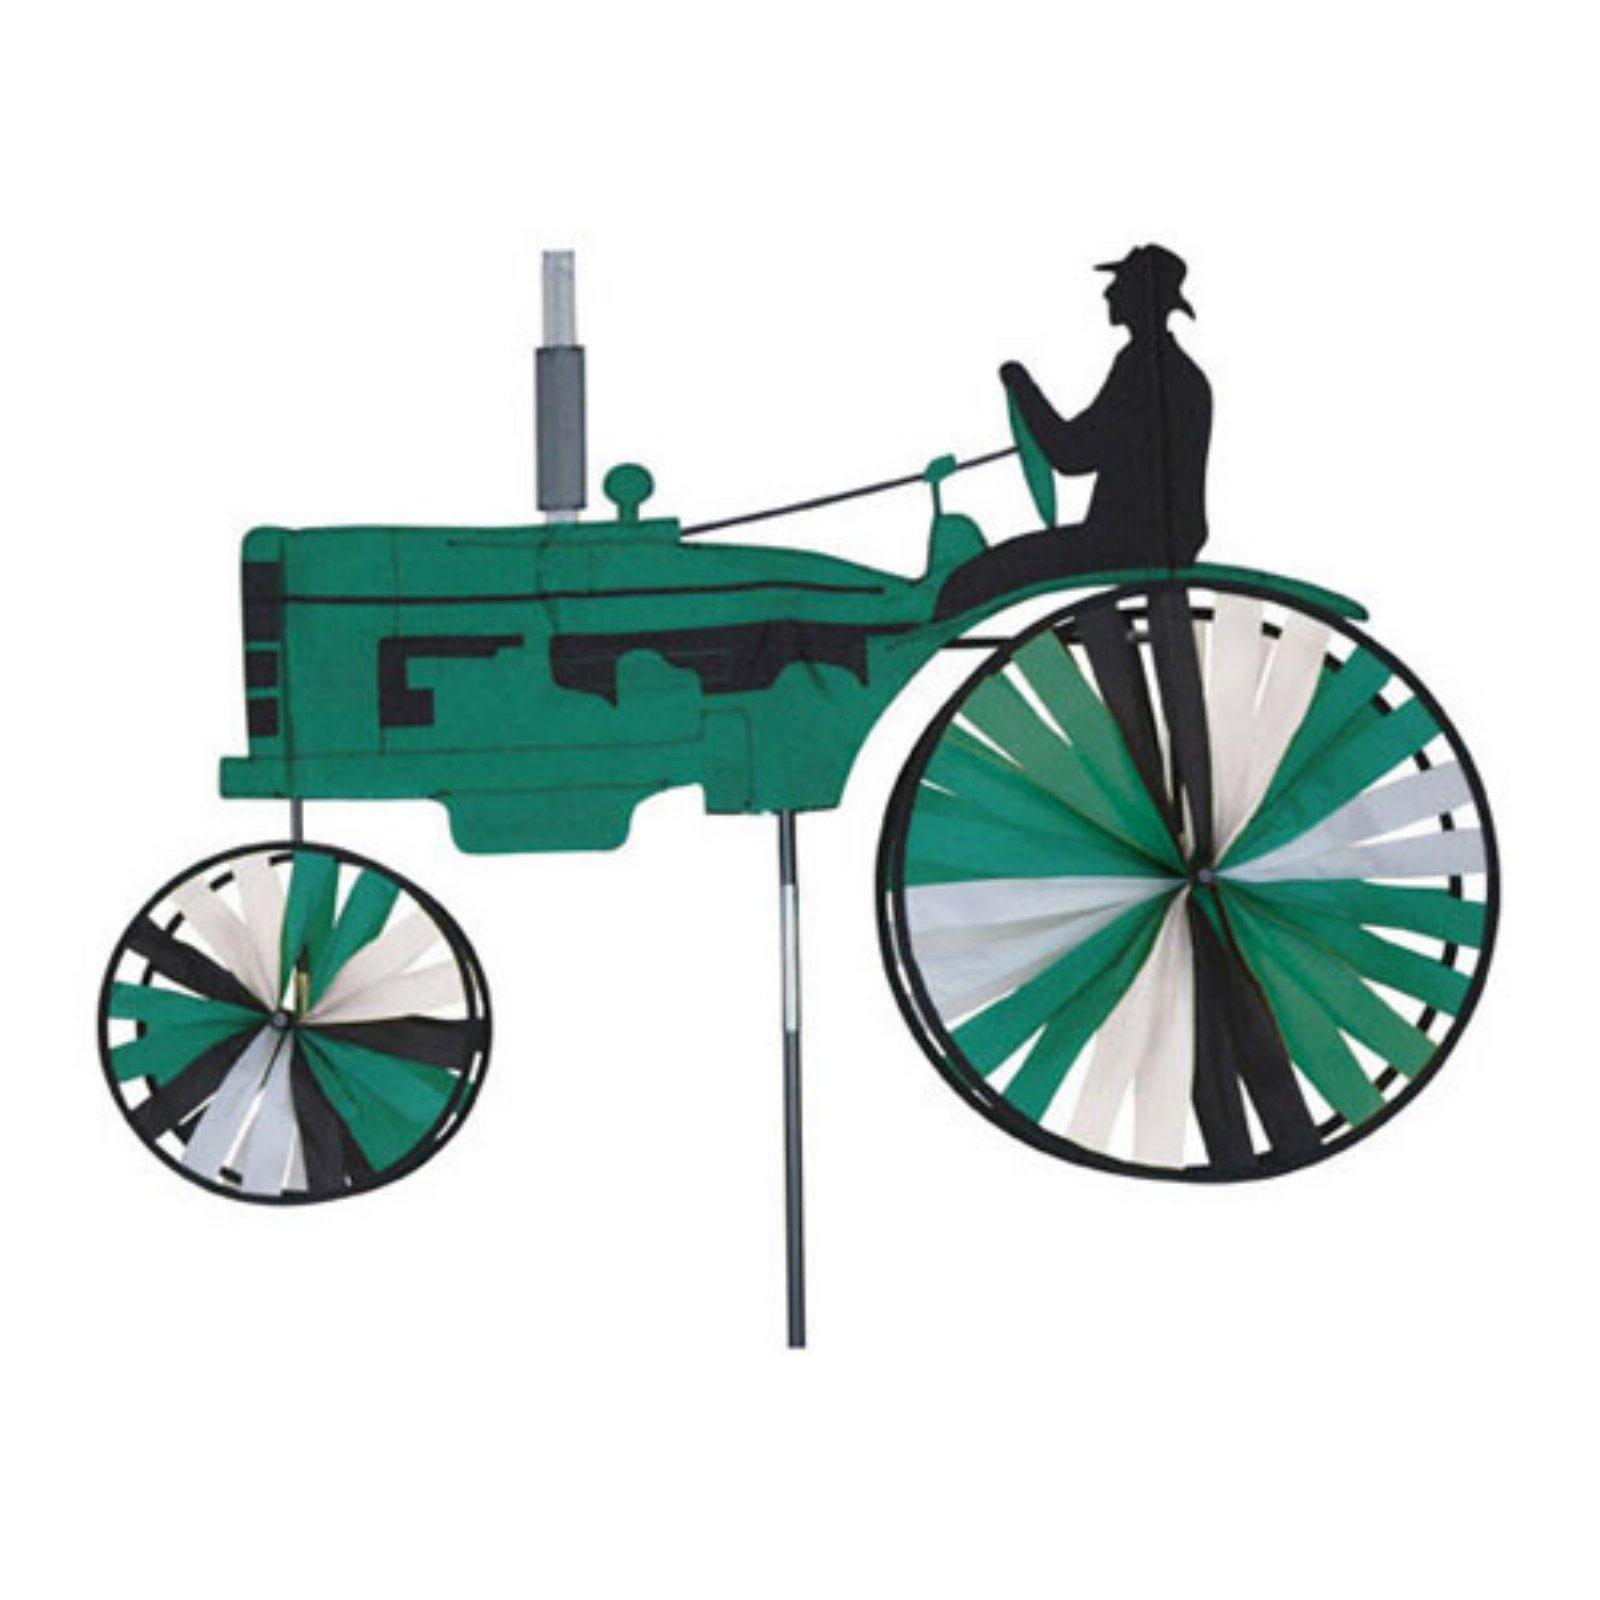 Premier Designs Green Tractor Spinner